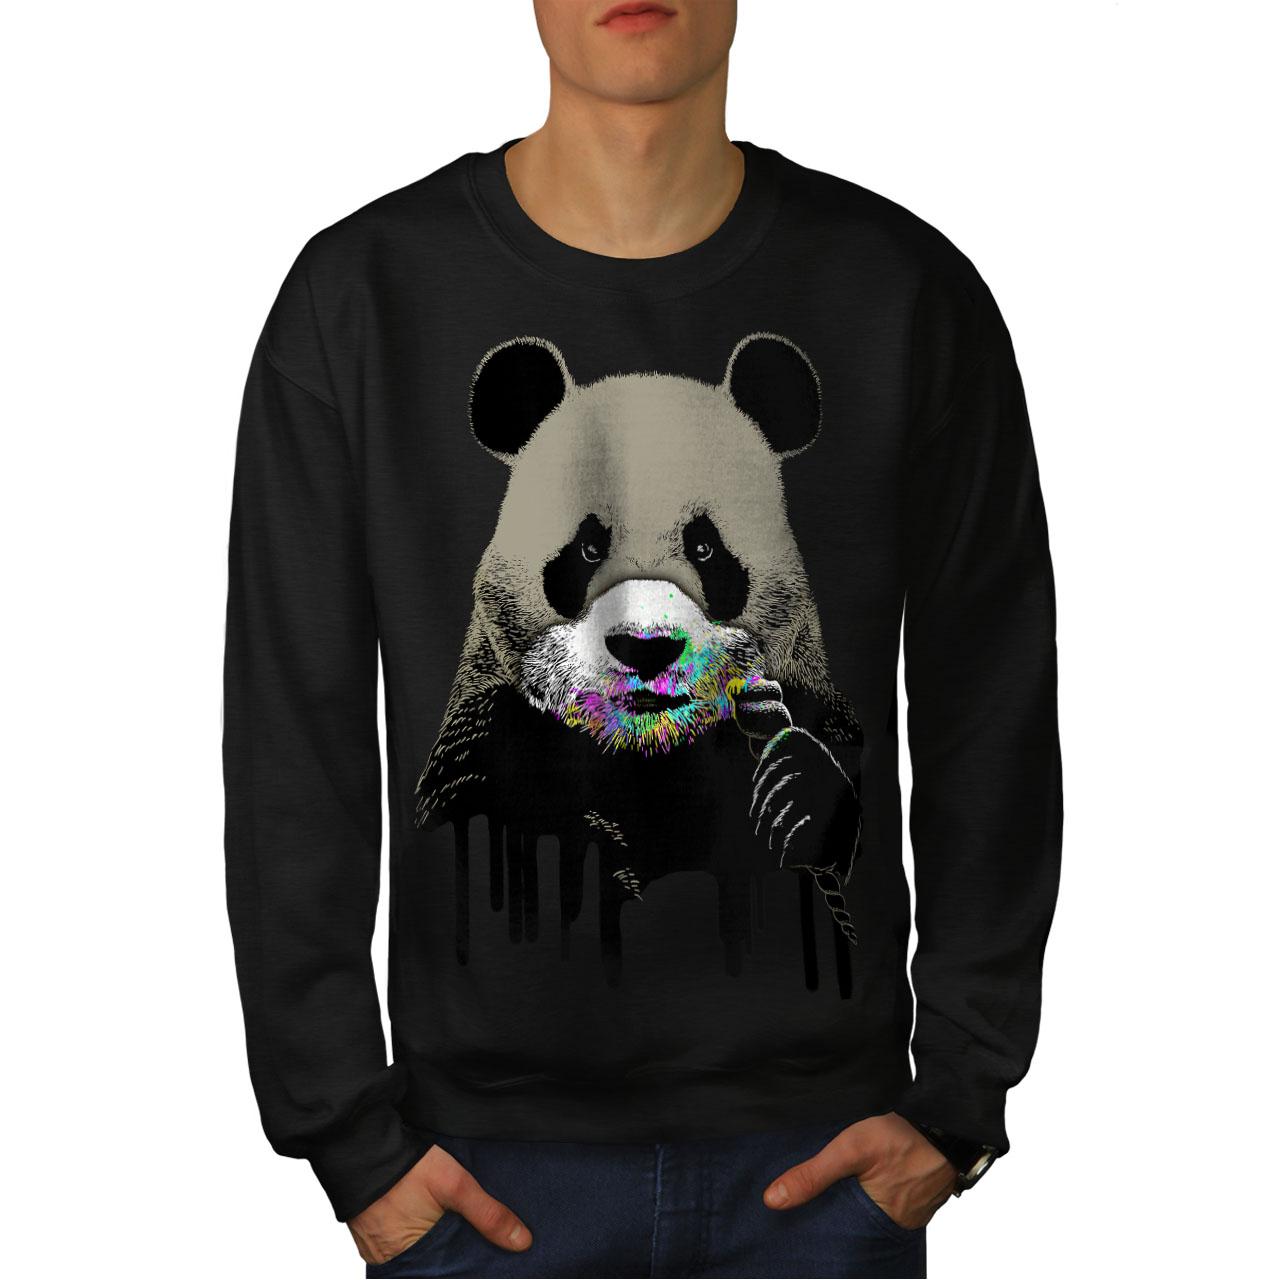 Wellcoda Raven Bird Wild Animal Mens Sweatshirt Bird Casual Pullover Jumper